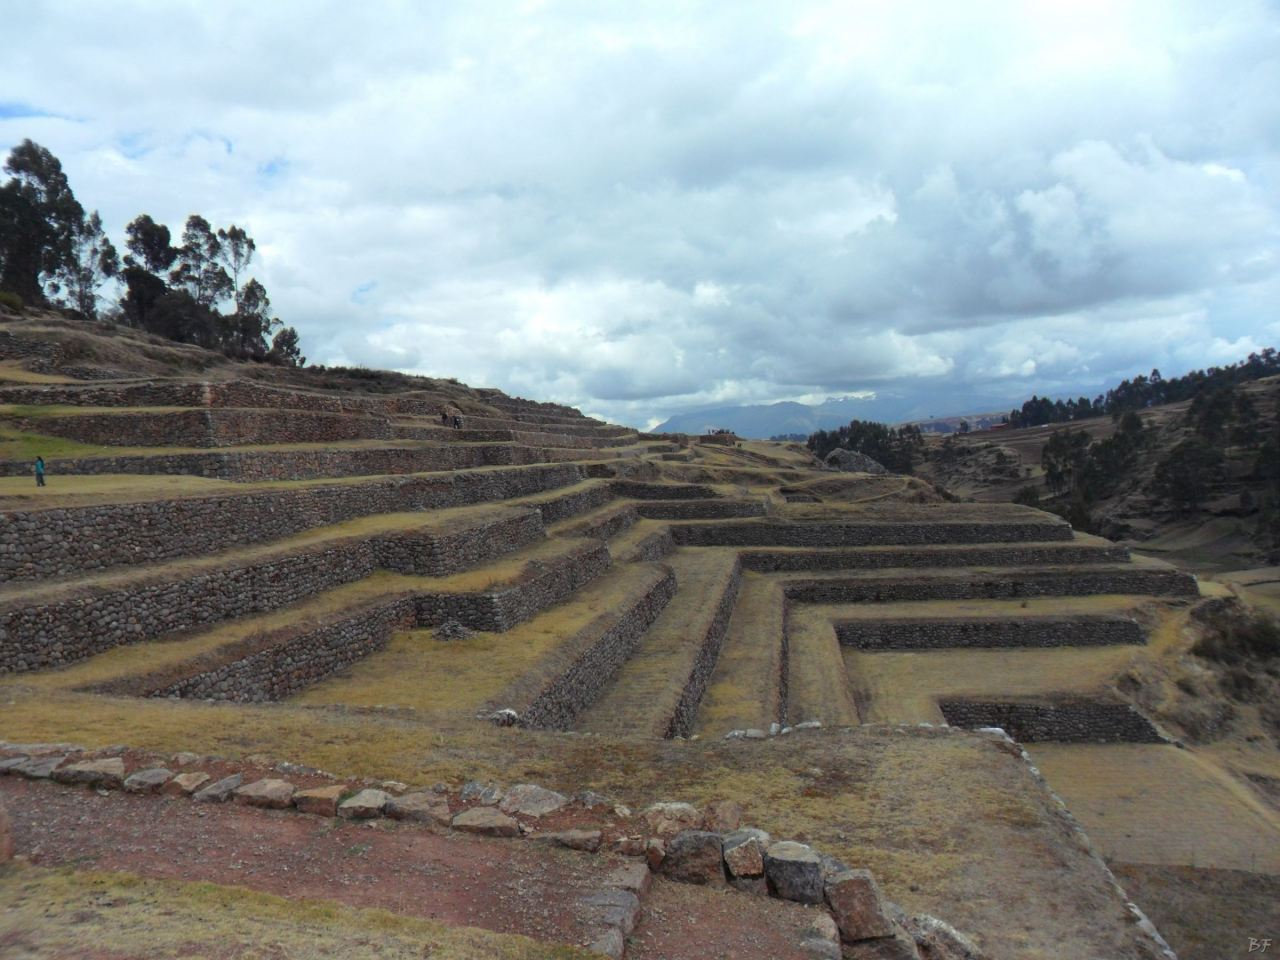 Chinchero-Mura-Poligonali-Piramide-Urubamba-Peru-63